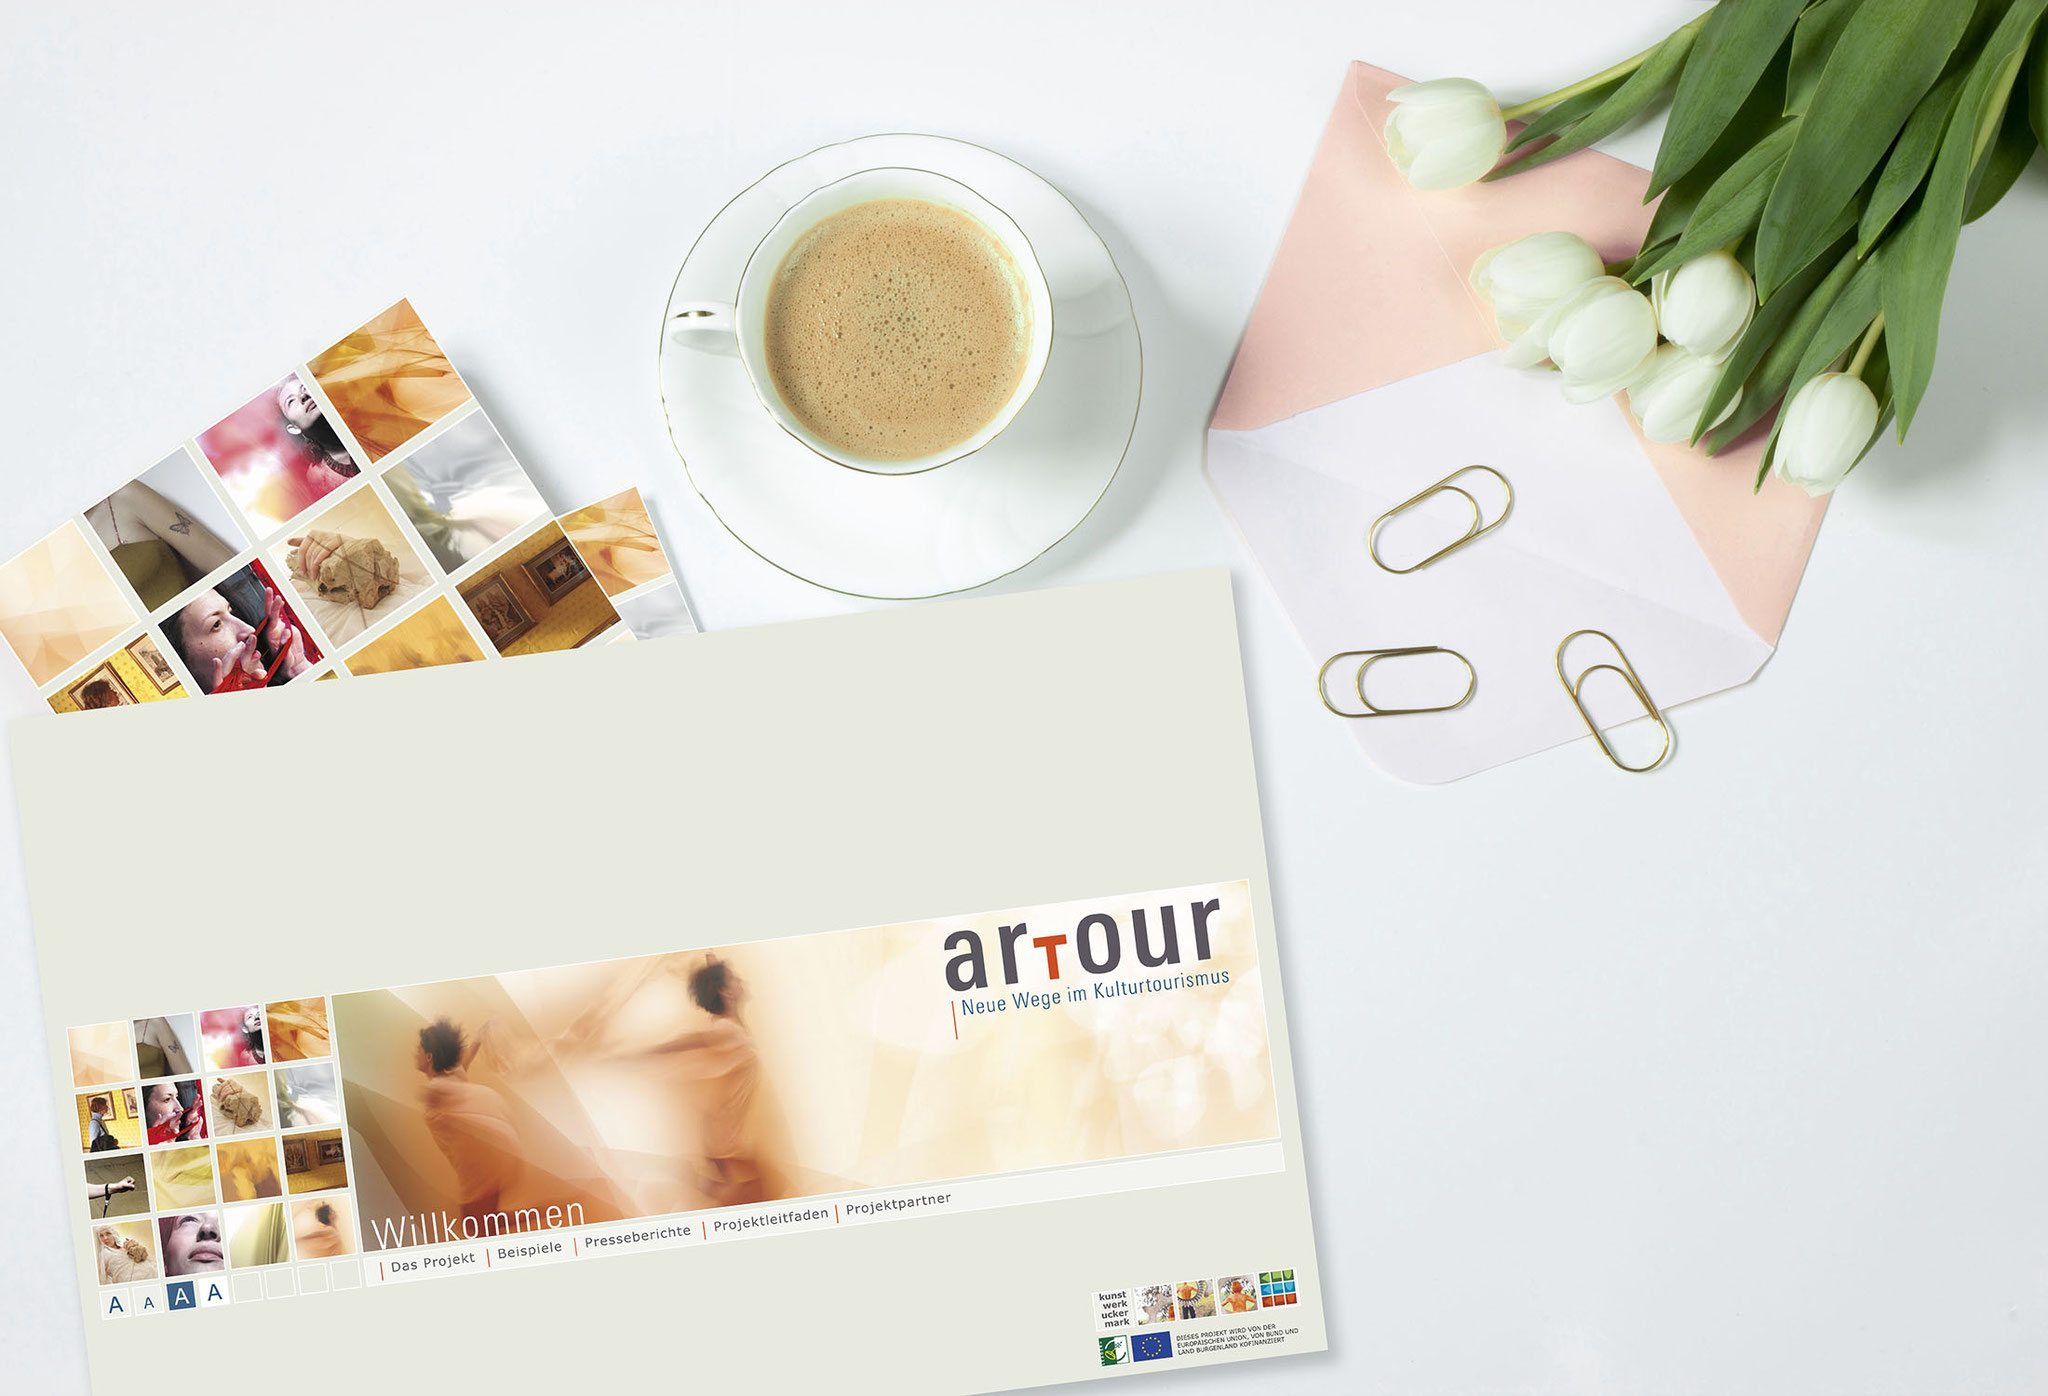 artour | CI nicht realisiert